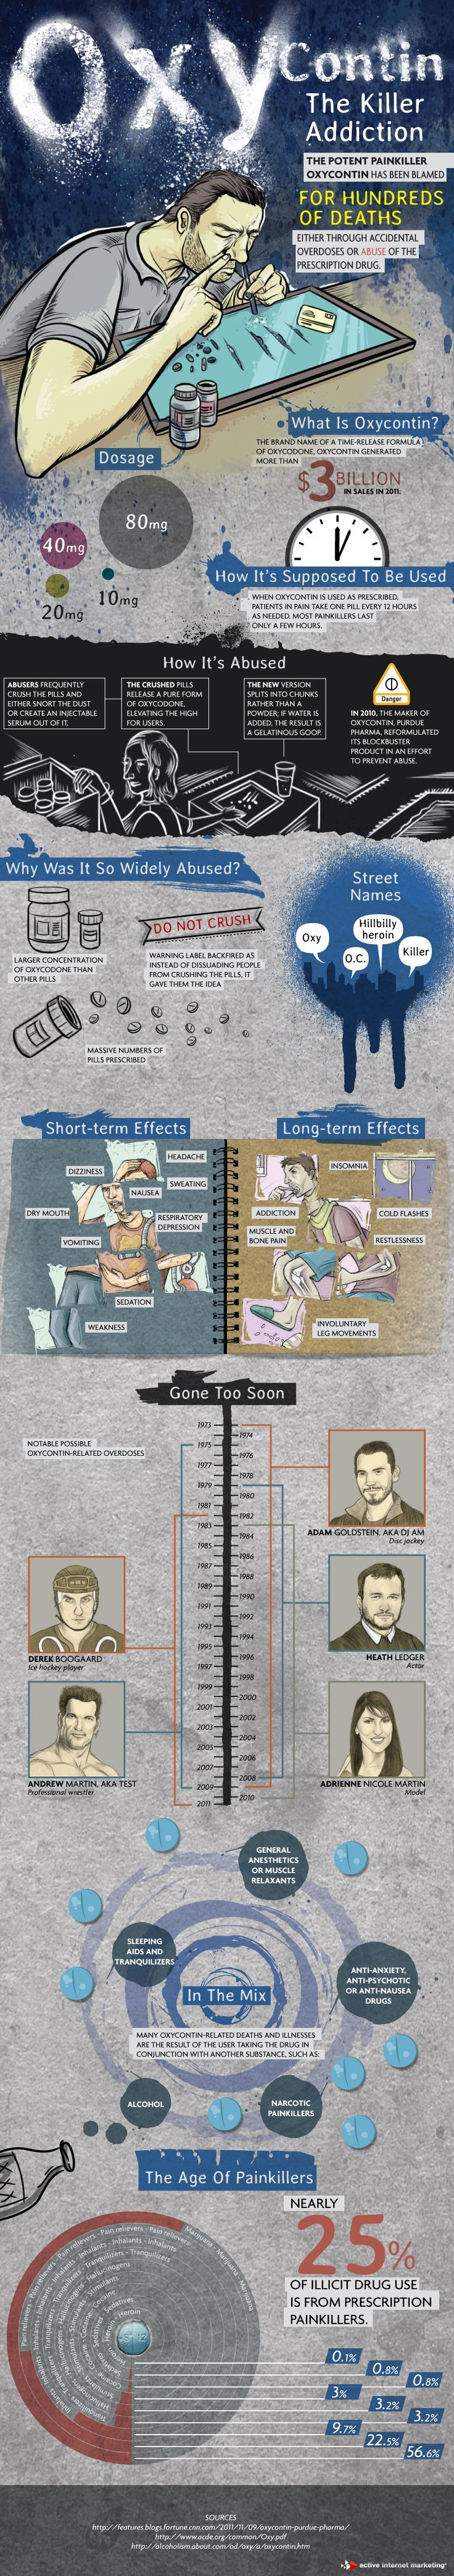 Oxycontin: The Killer Addiction for bestdrugrehabilitation.com #infographic #drugs